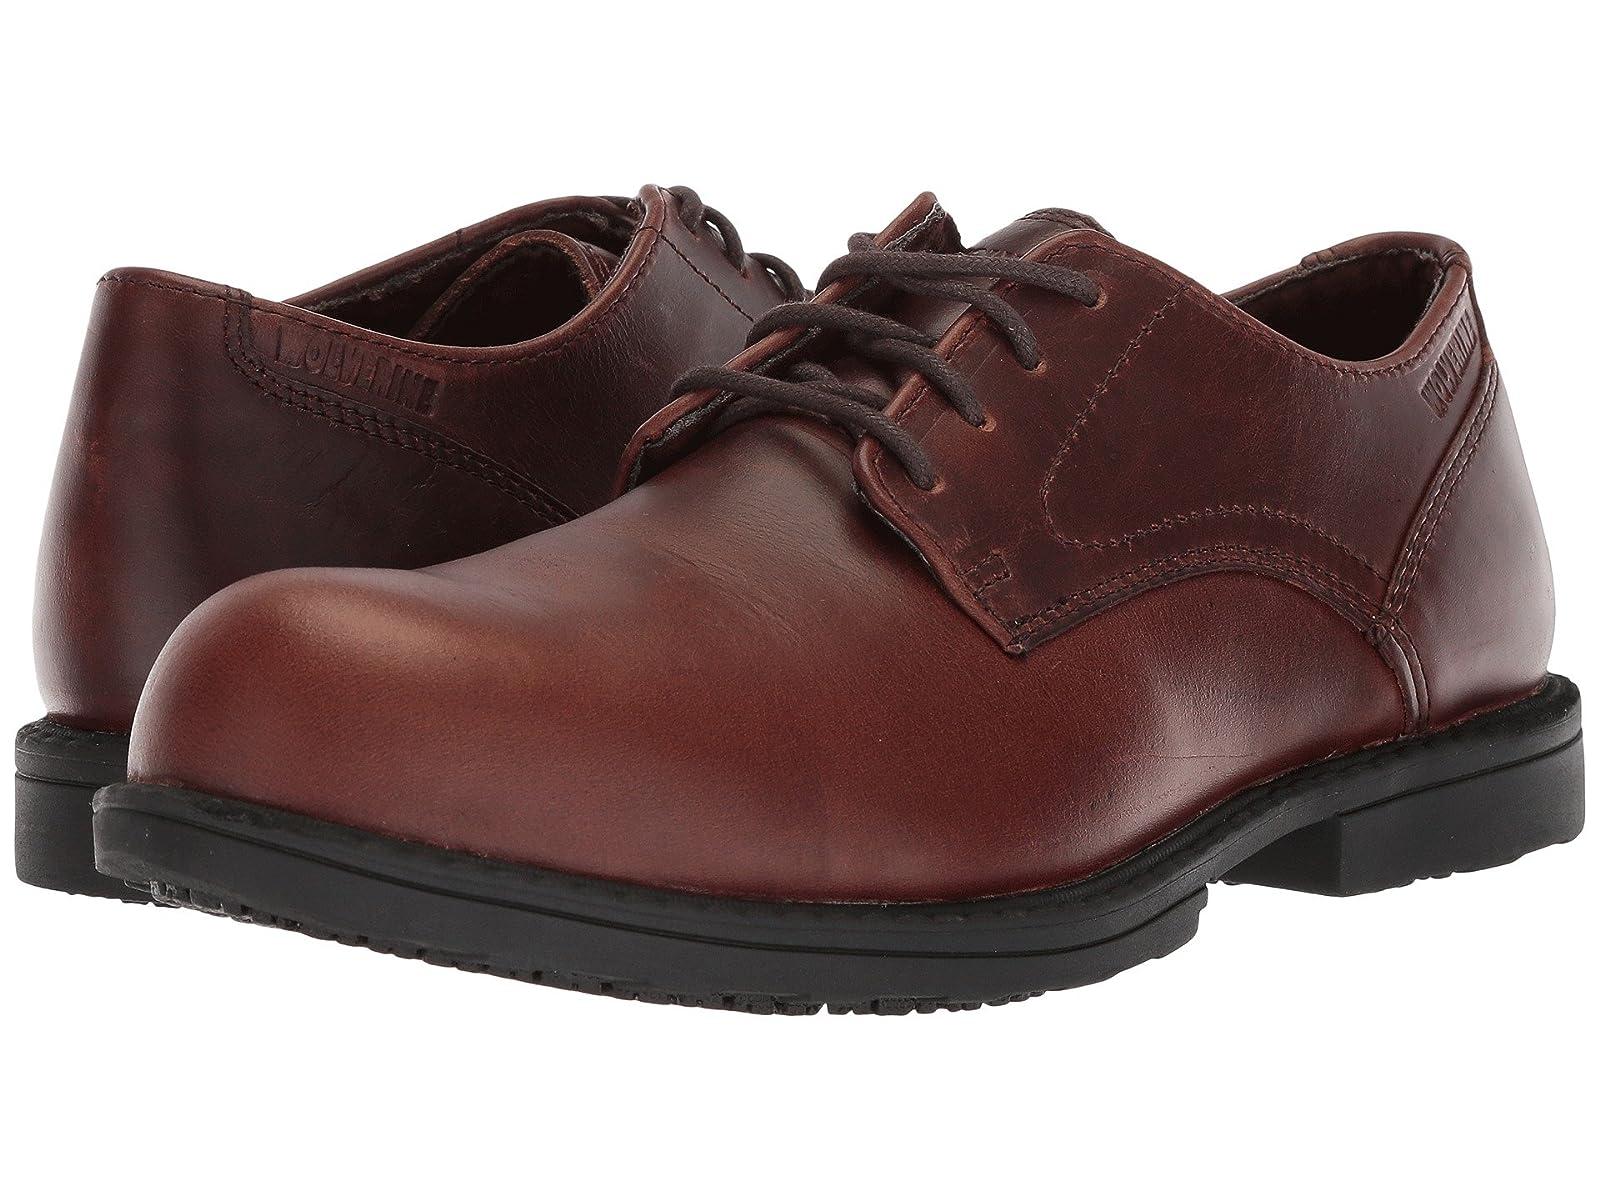 Wolverine Bedford Oxford Steel ToeAtmospheric grades have affordable shoes